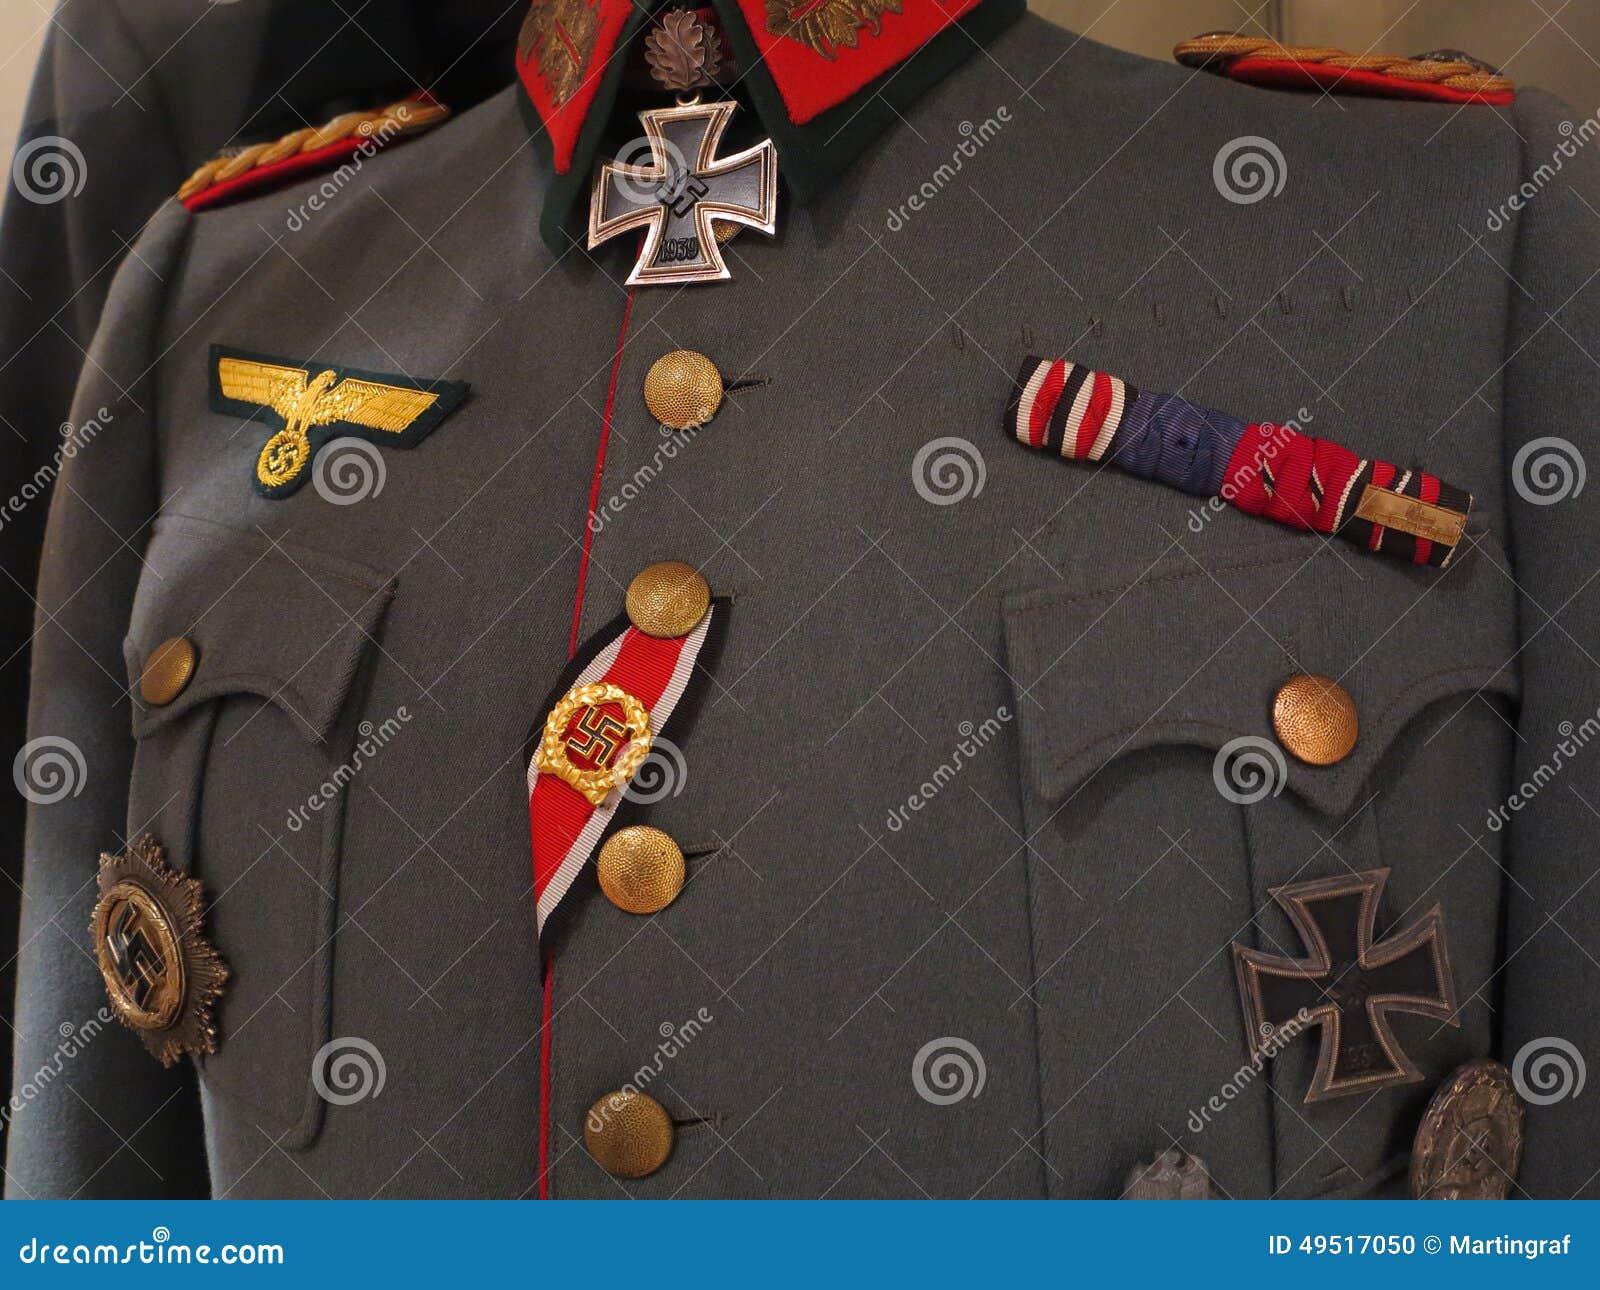 Second world war german formal military uniform stock photo image 49517050 - German military decorations ww2 ...